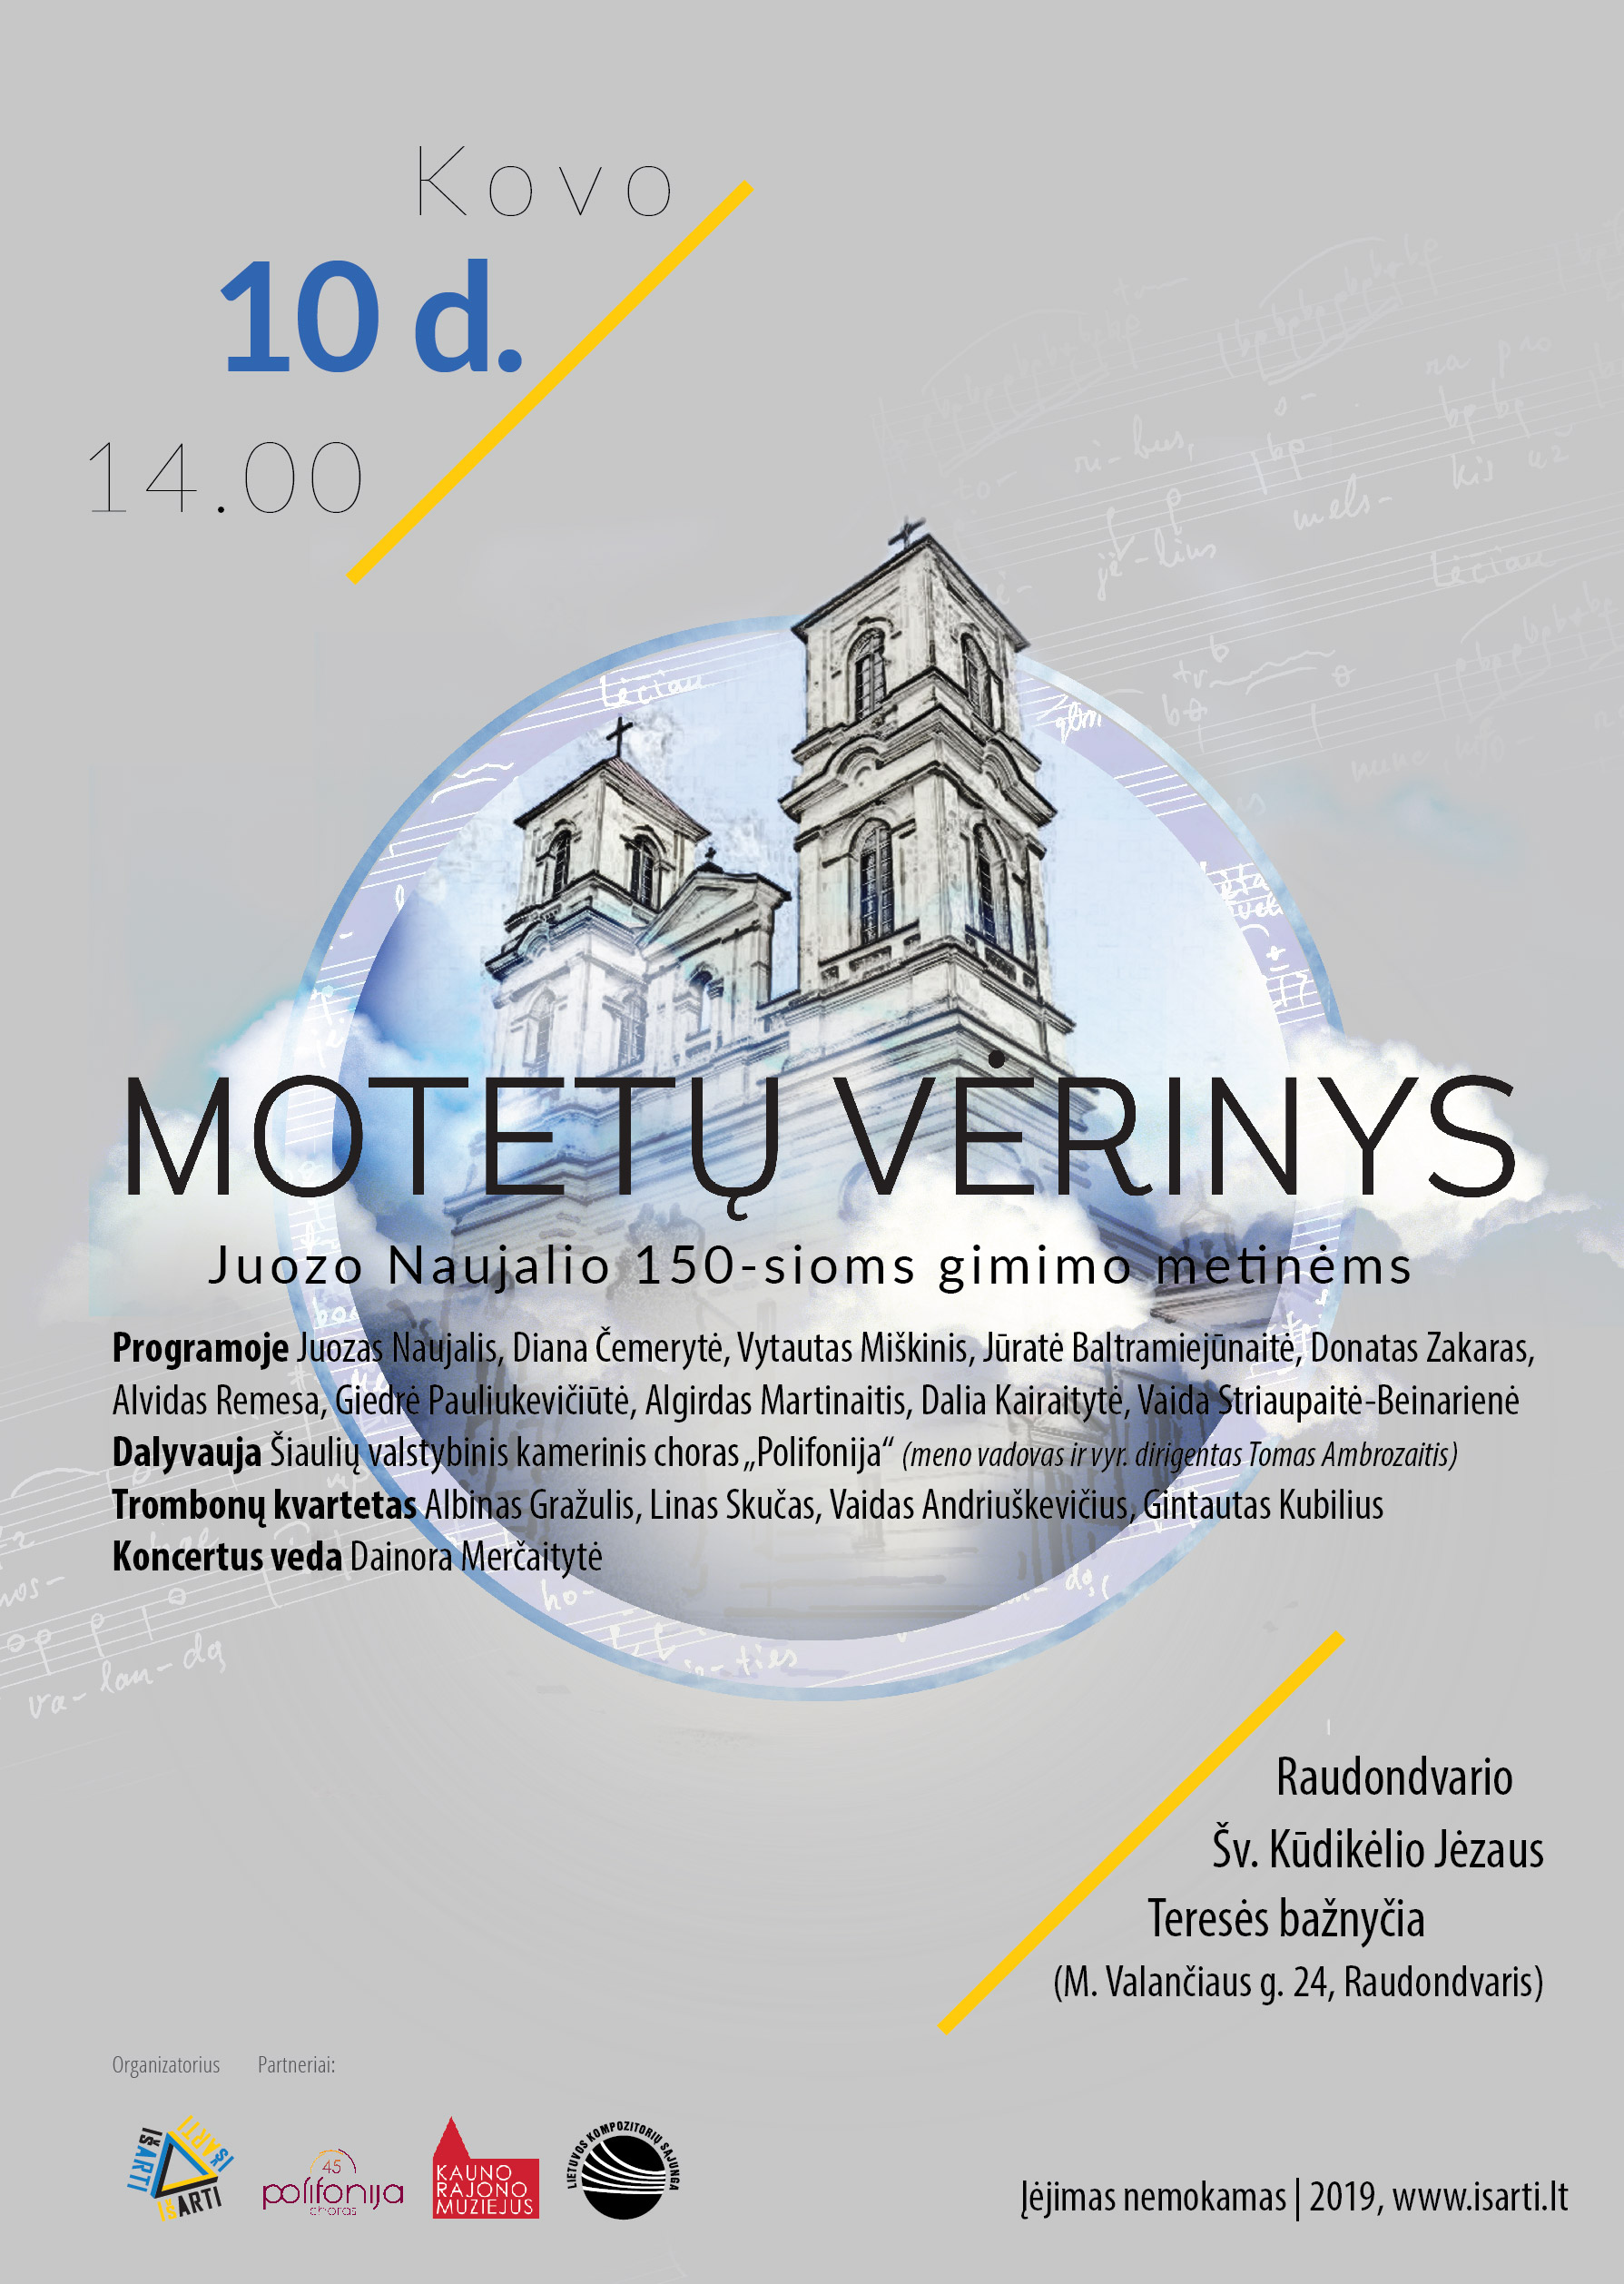 Plakatas_MOTETU VERINYS_raudondvaris